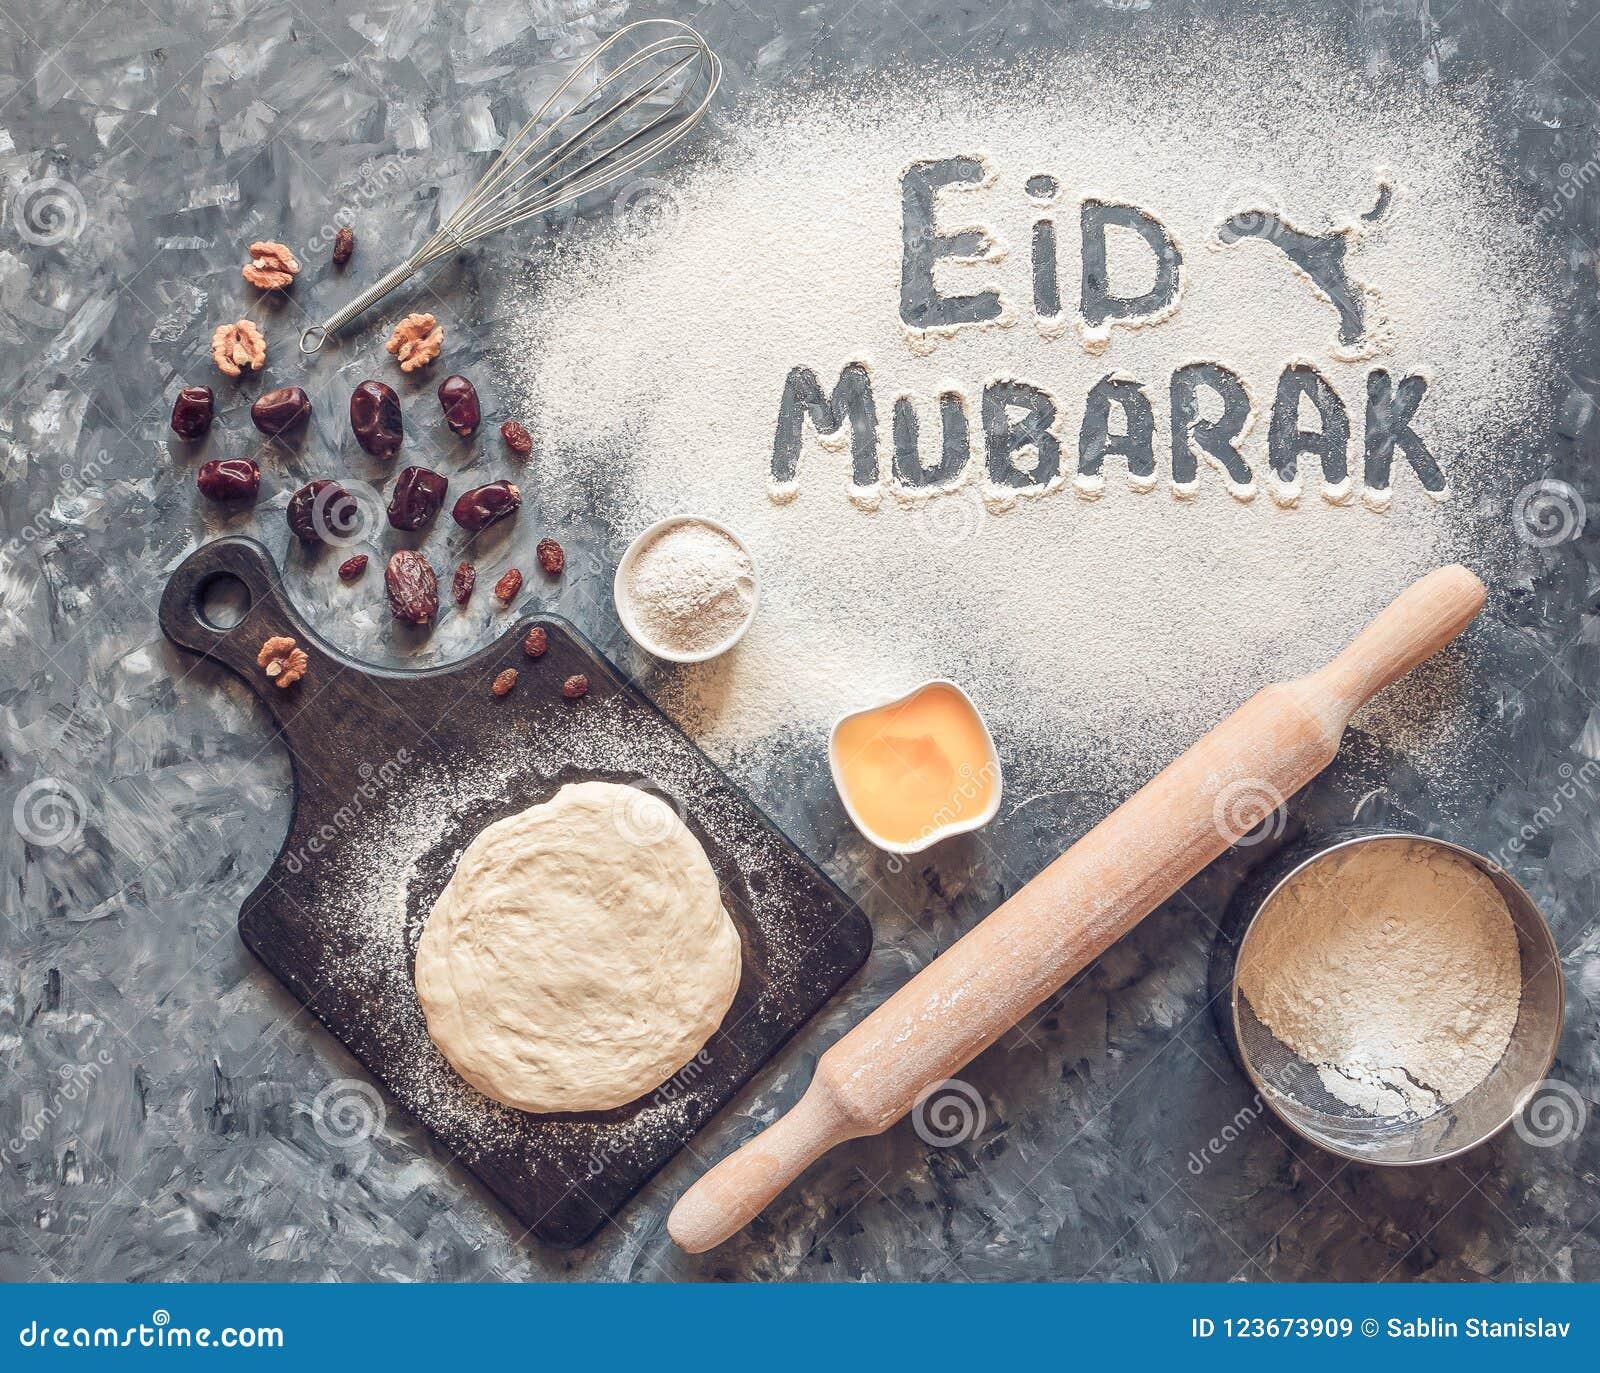 Eid Mubarak Islamic Holiday Welcome Phrase Happy Holiday